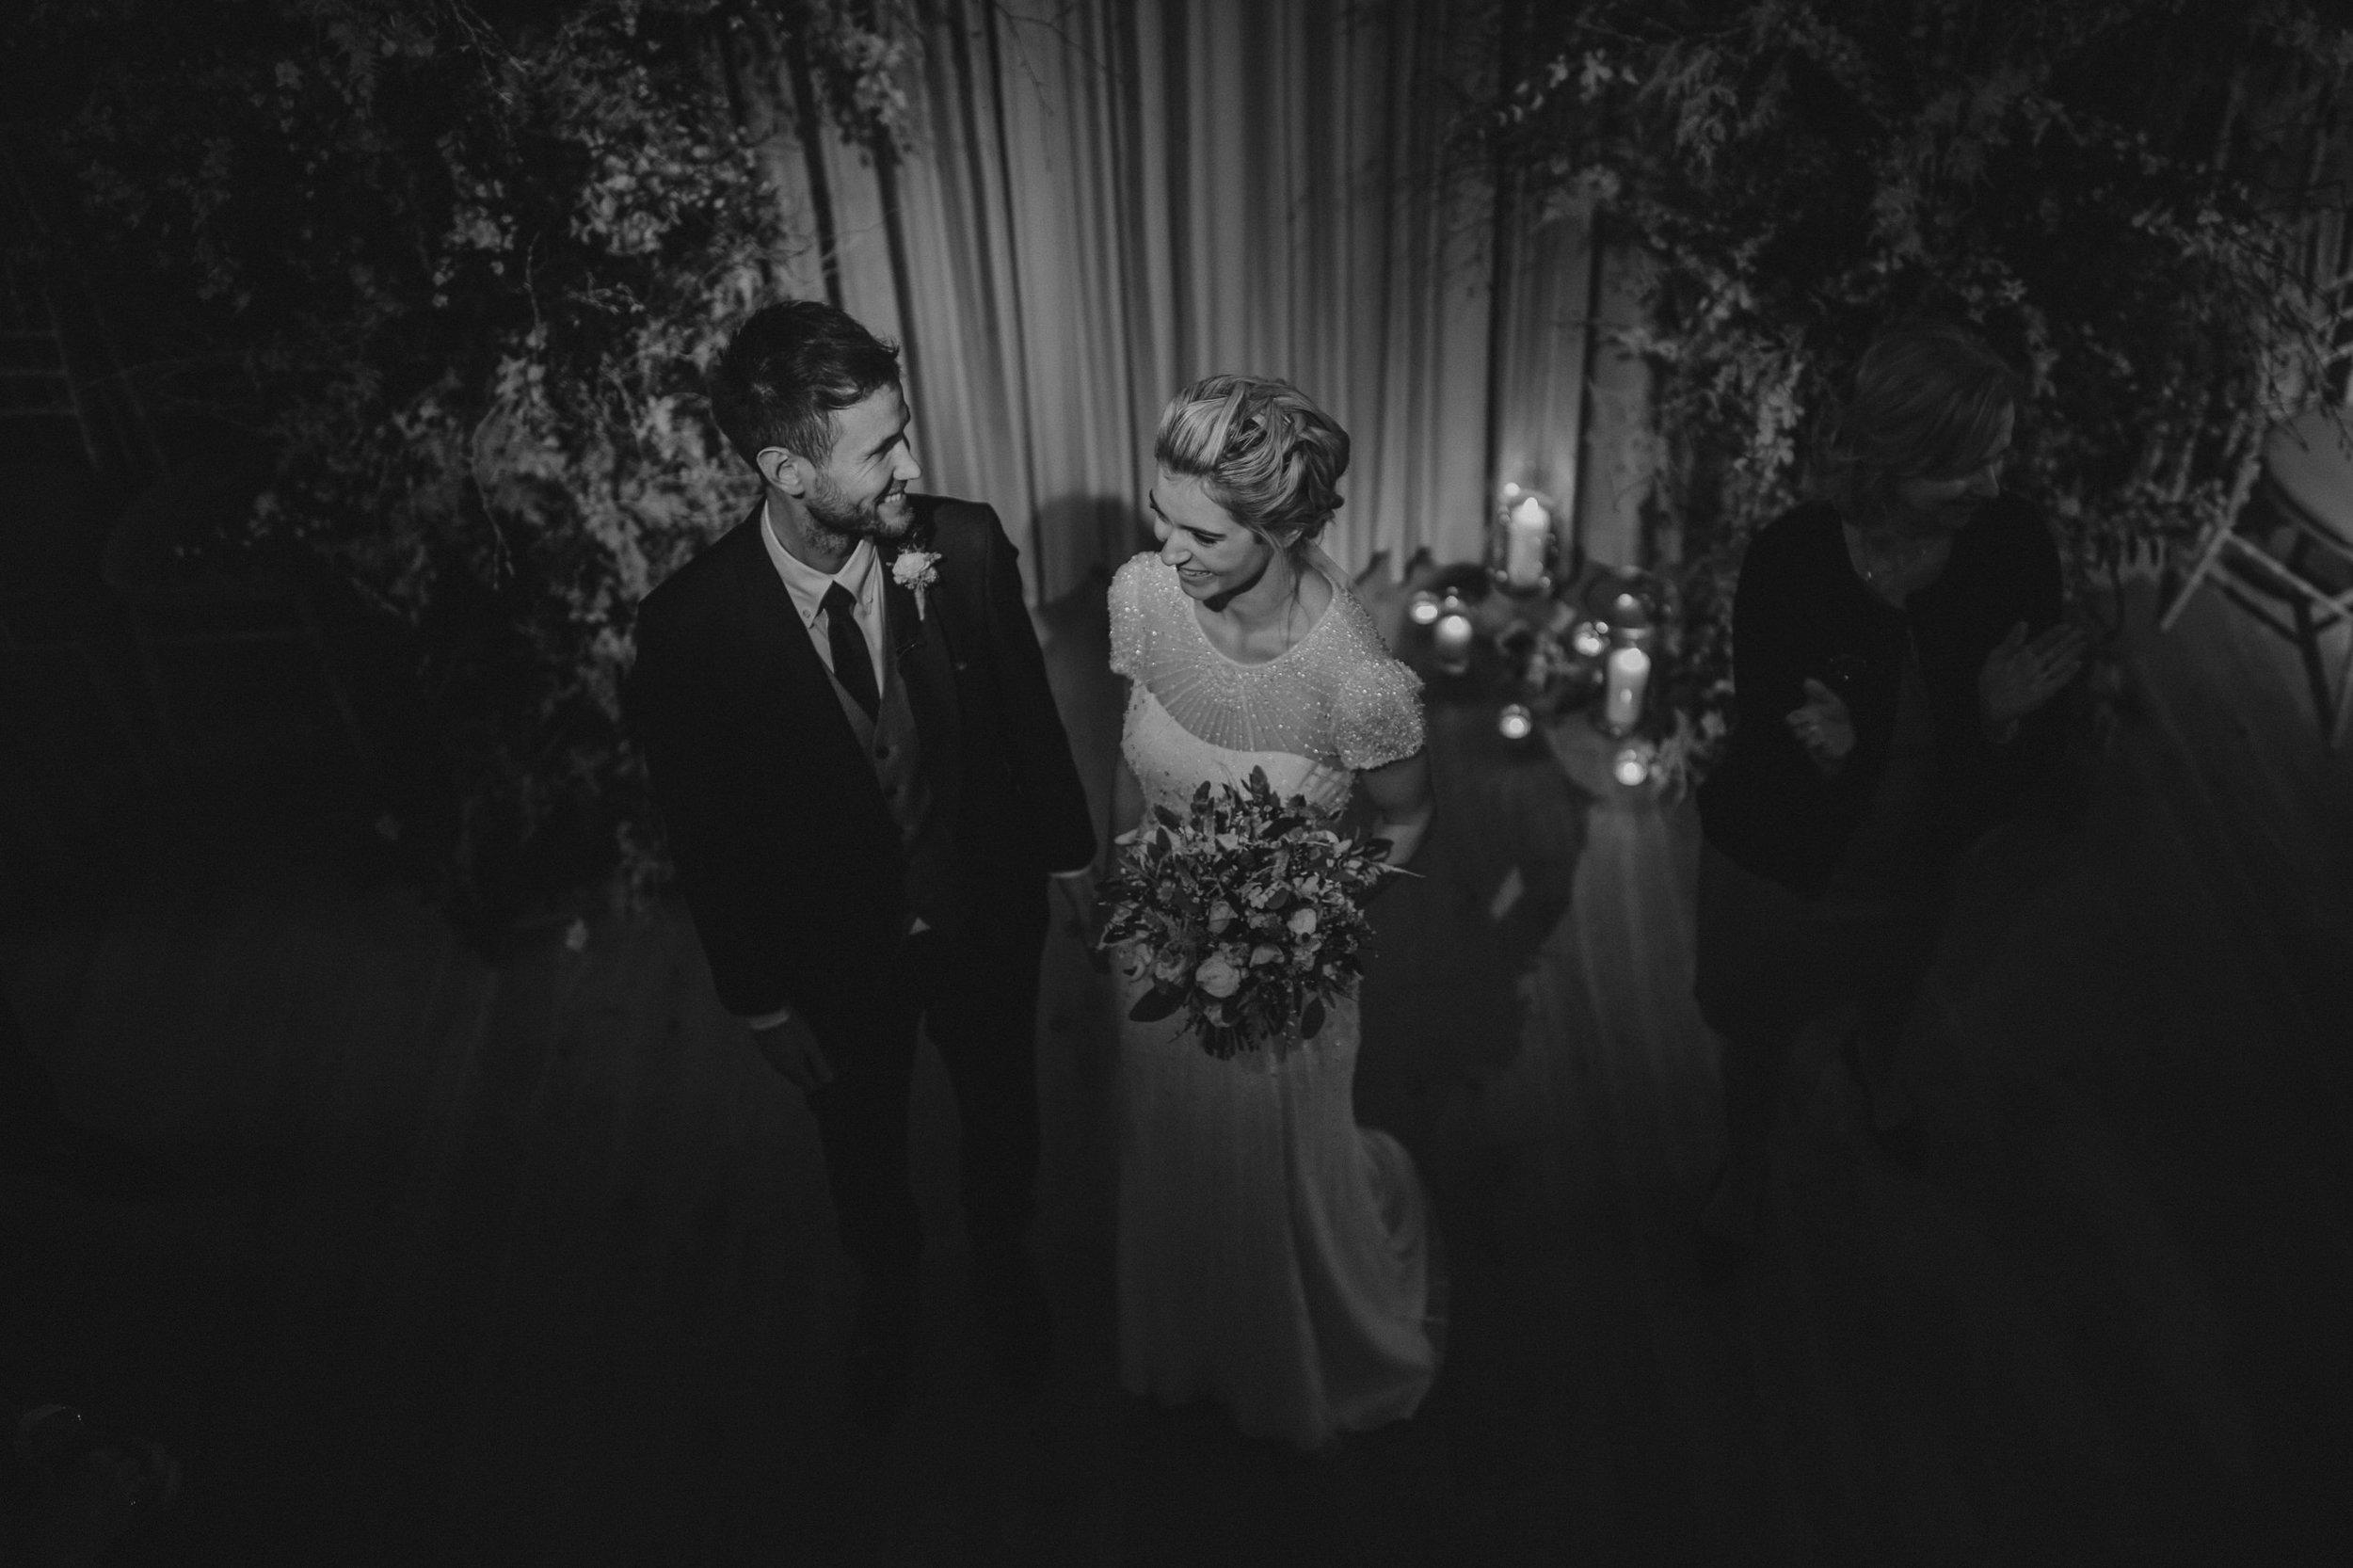 London_wedding_photographer_gione_da_silva_carelle_paul147.jpg